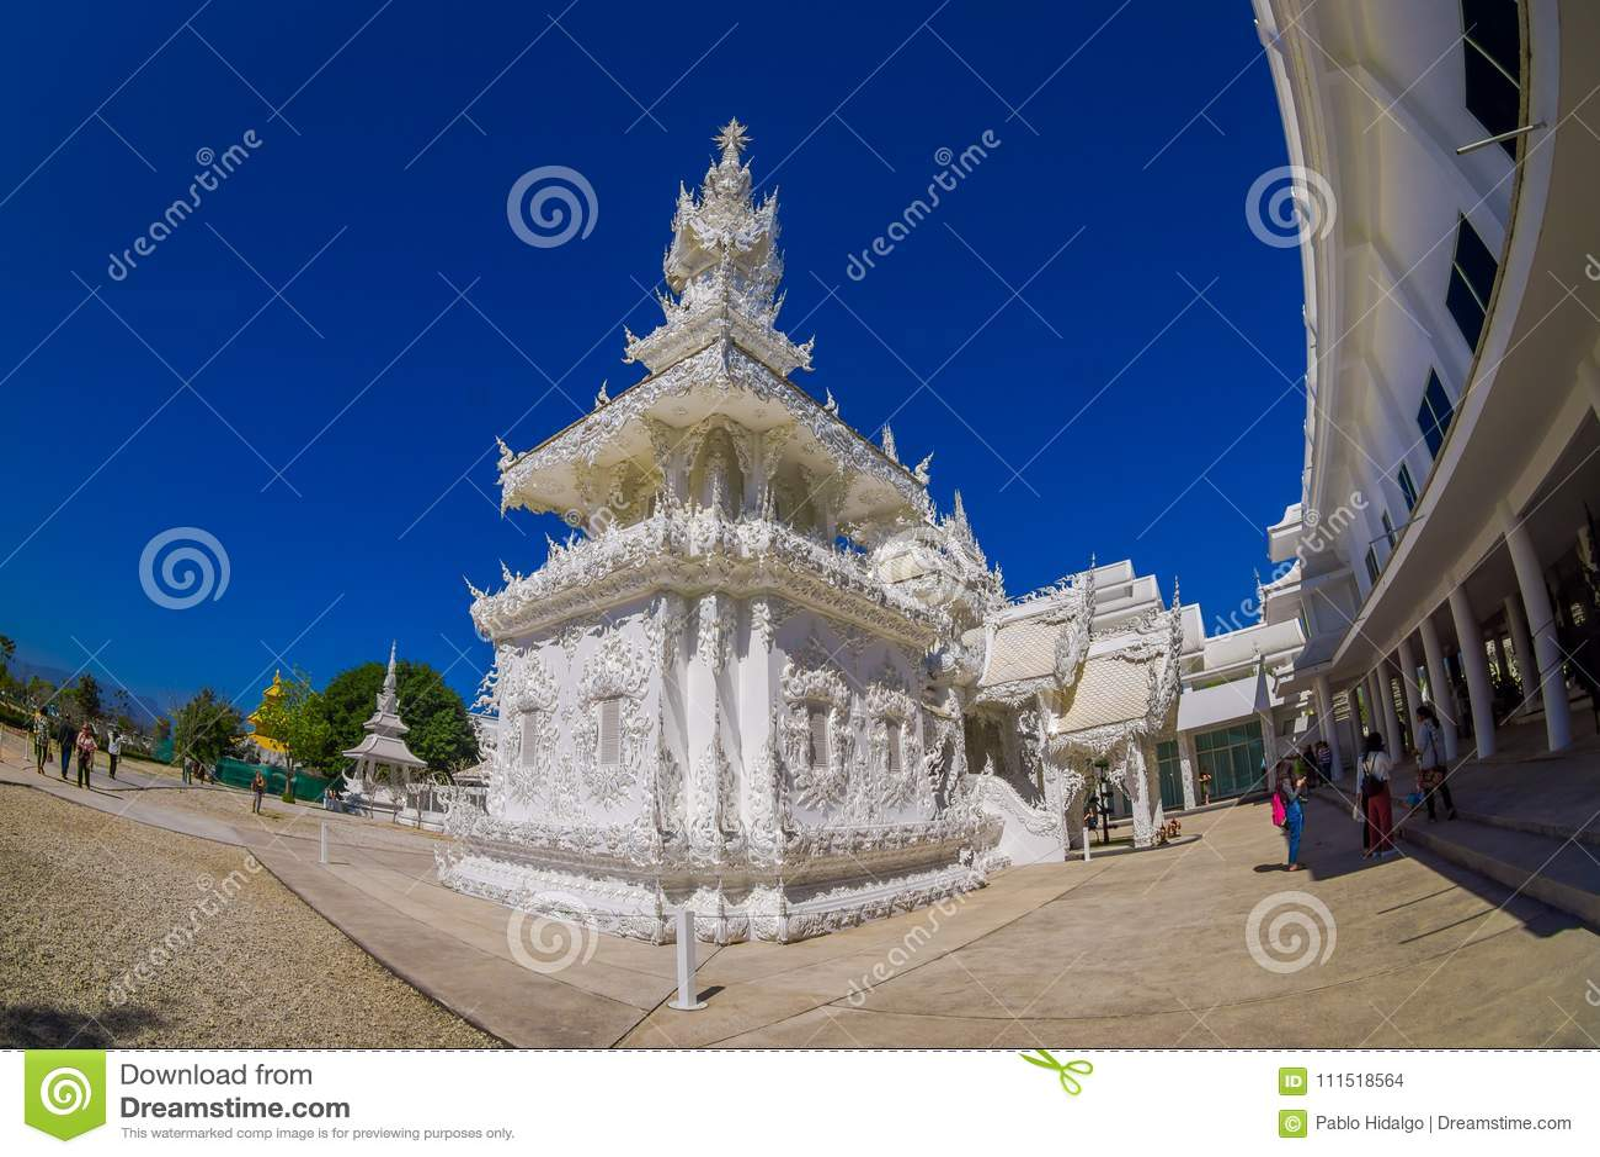 CHIANG RAI, THAILAND - FEBRUARY 01, 2018: Beautiful White